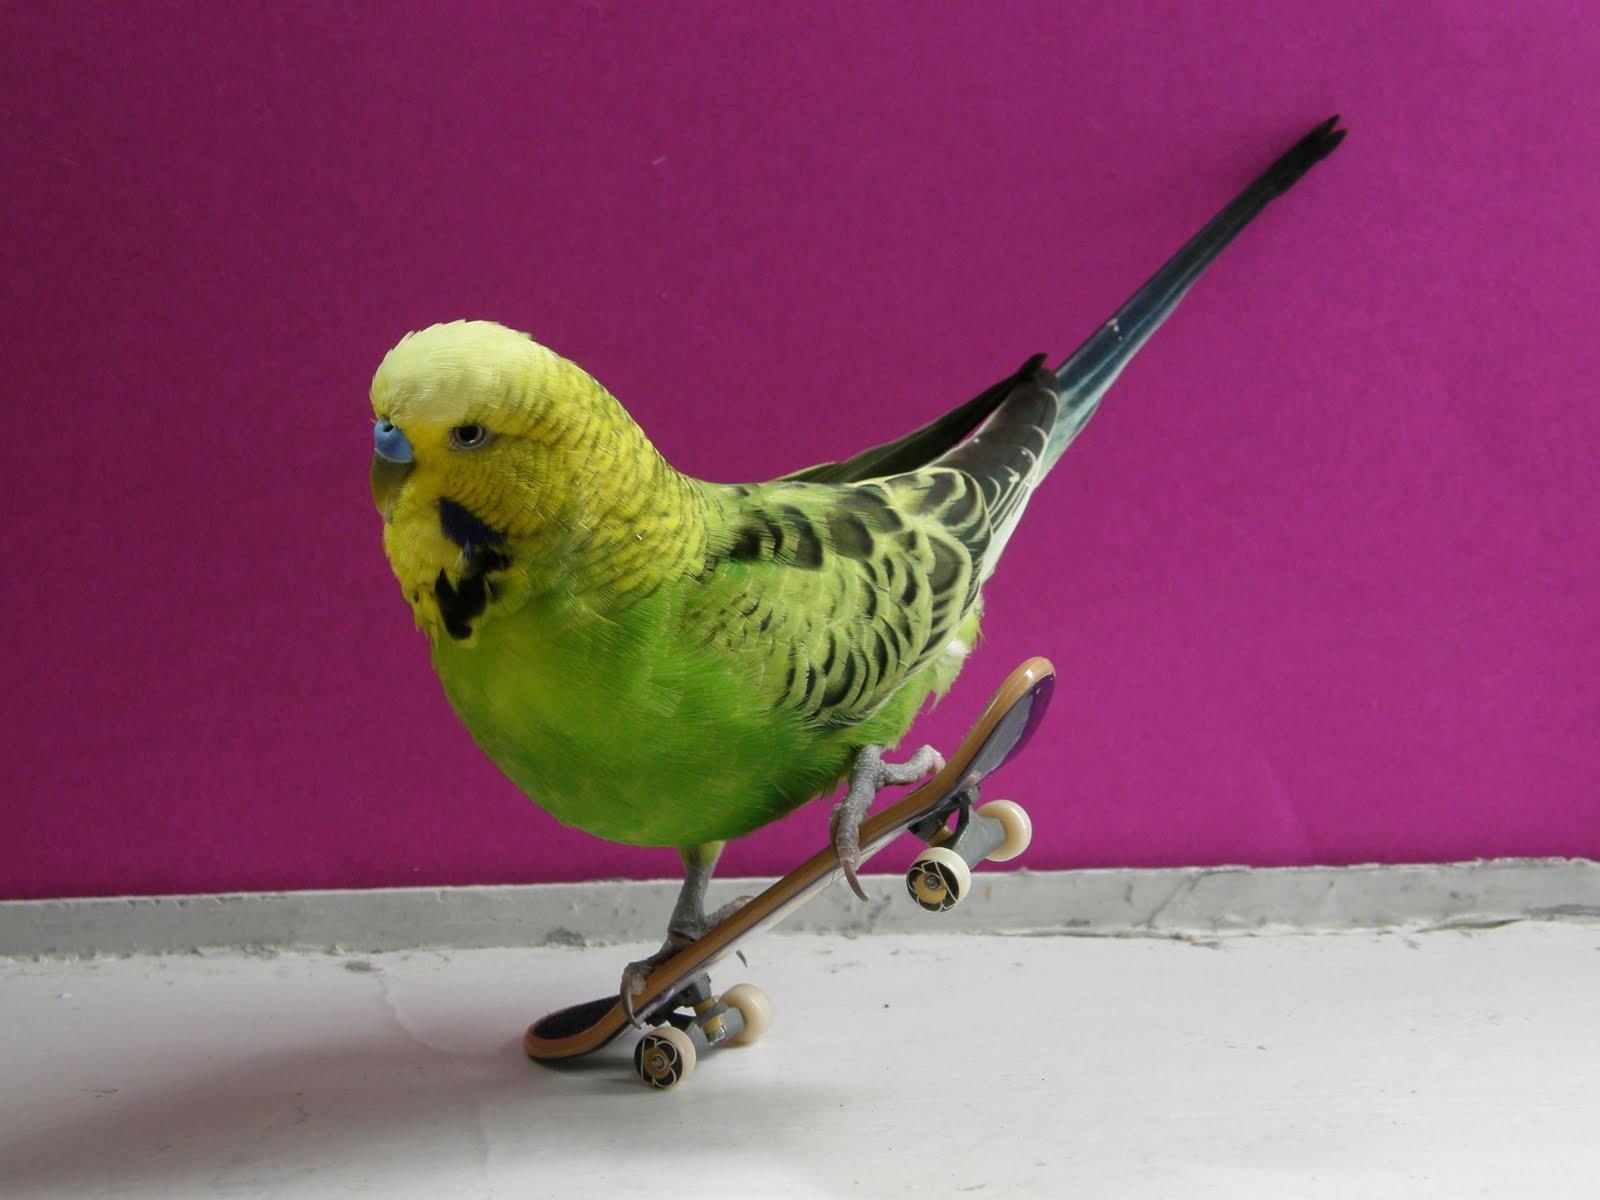 Best Hd Wallpapers Birds Wallpaper